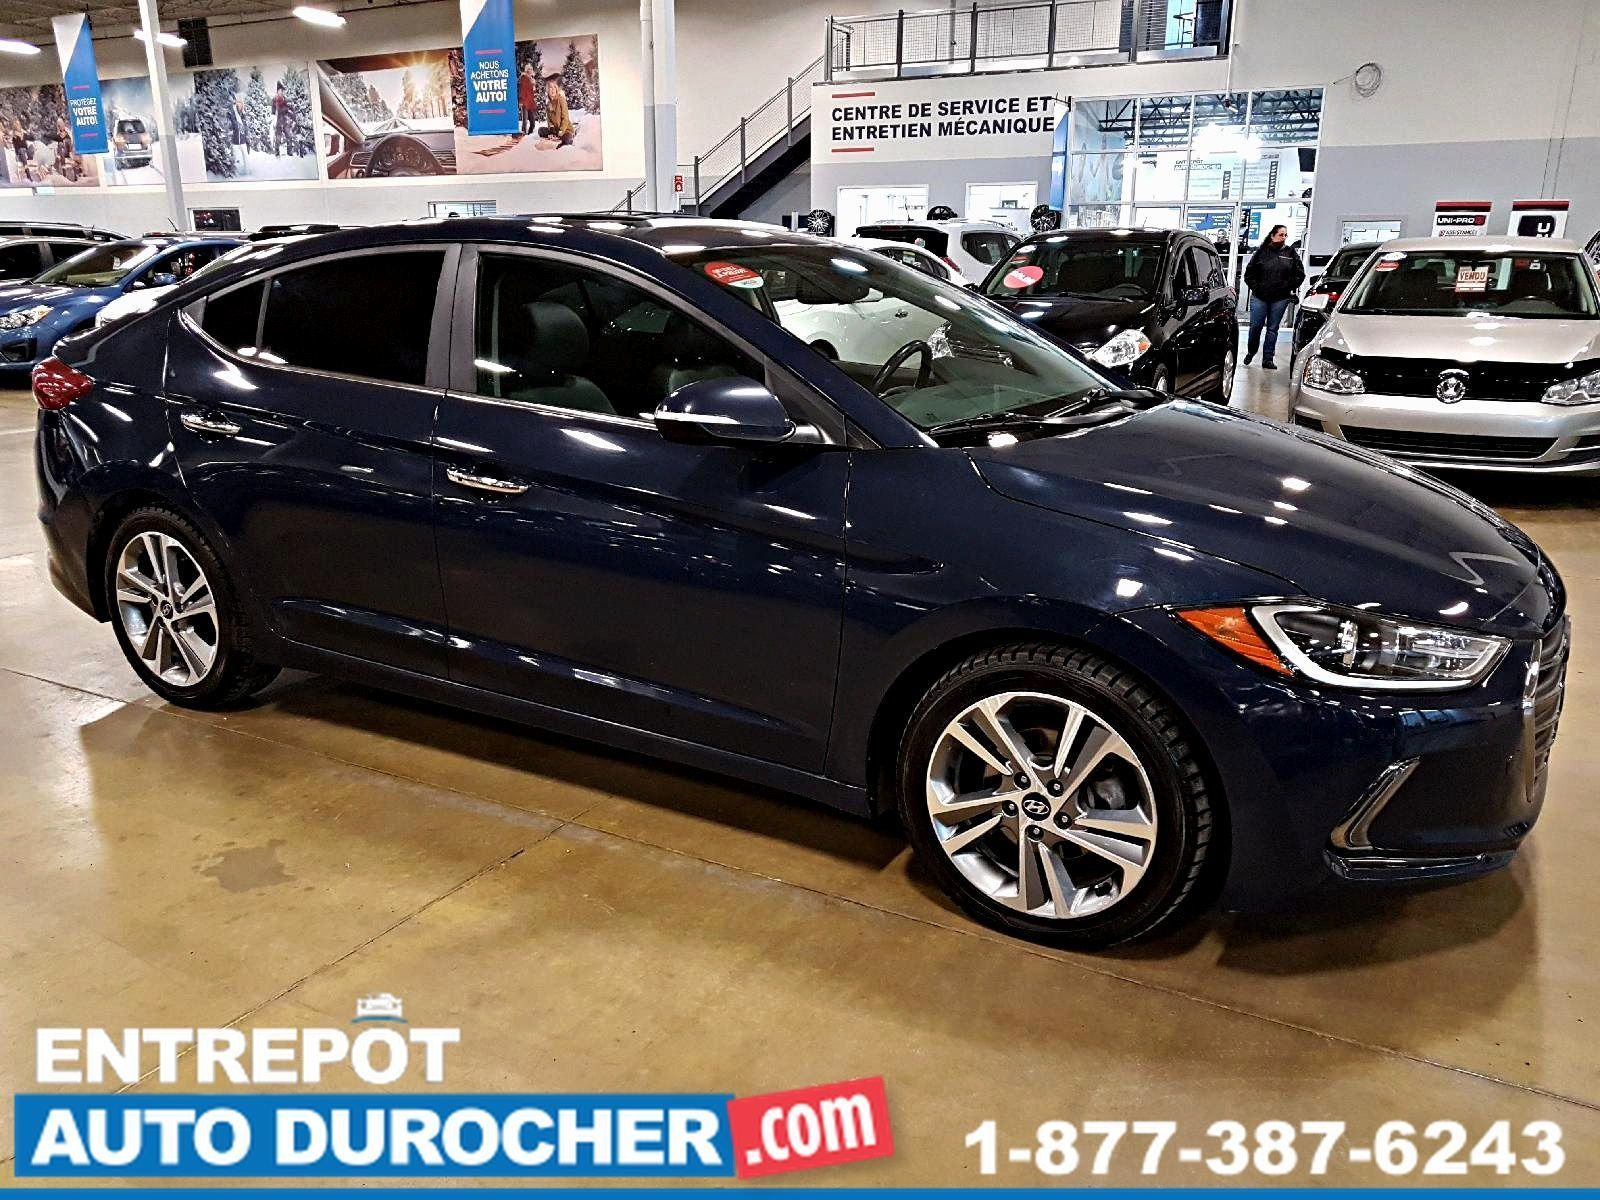 2017  Hyundai Elantra LIMITED - TOIT OUVRANT - CUIR - AUTOMATIQUE